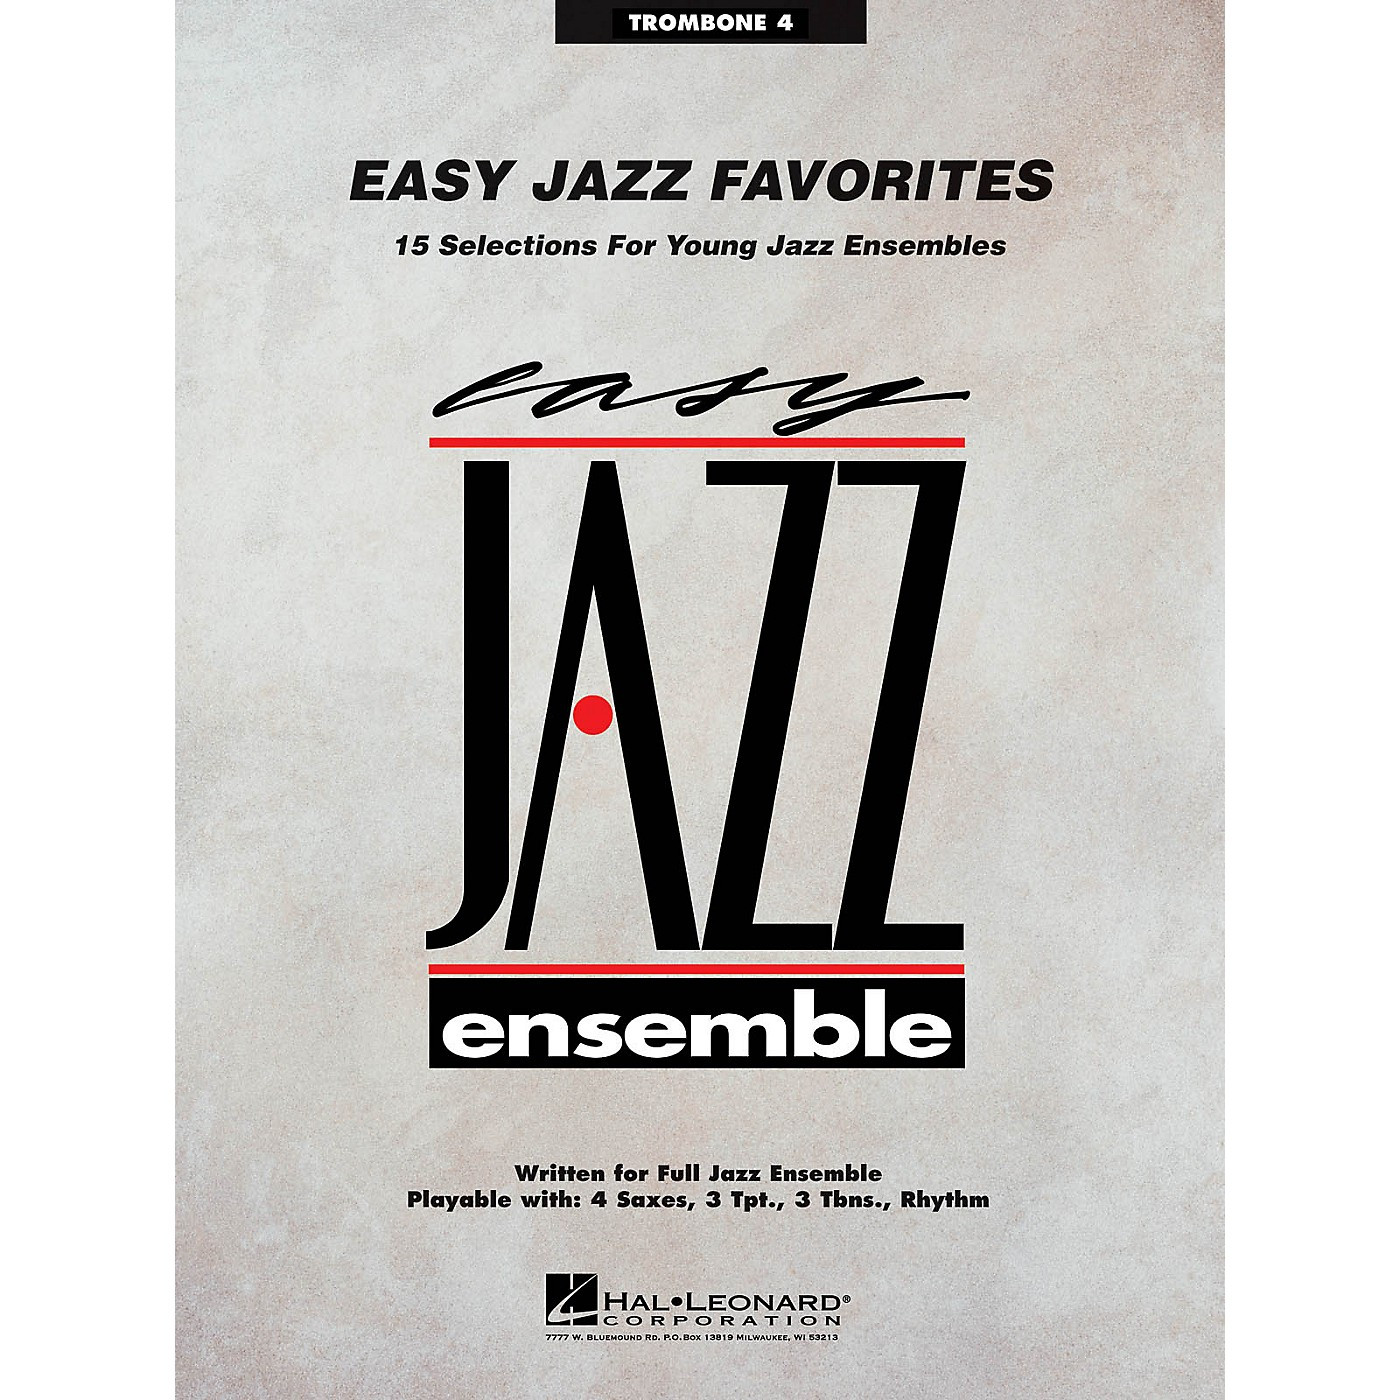 Hal Leonard Easy Jazz Favorites - Trombone 4 Jazz Band Level 2 Composed by Various thumbnail